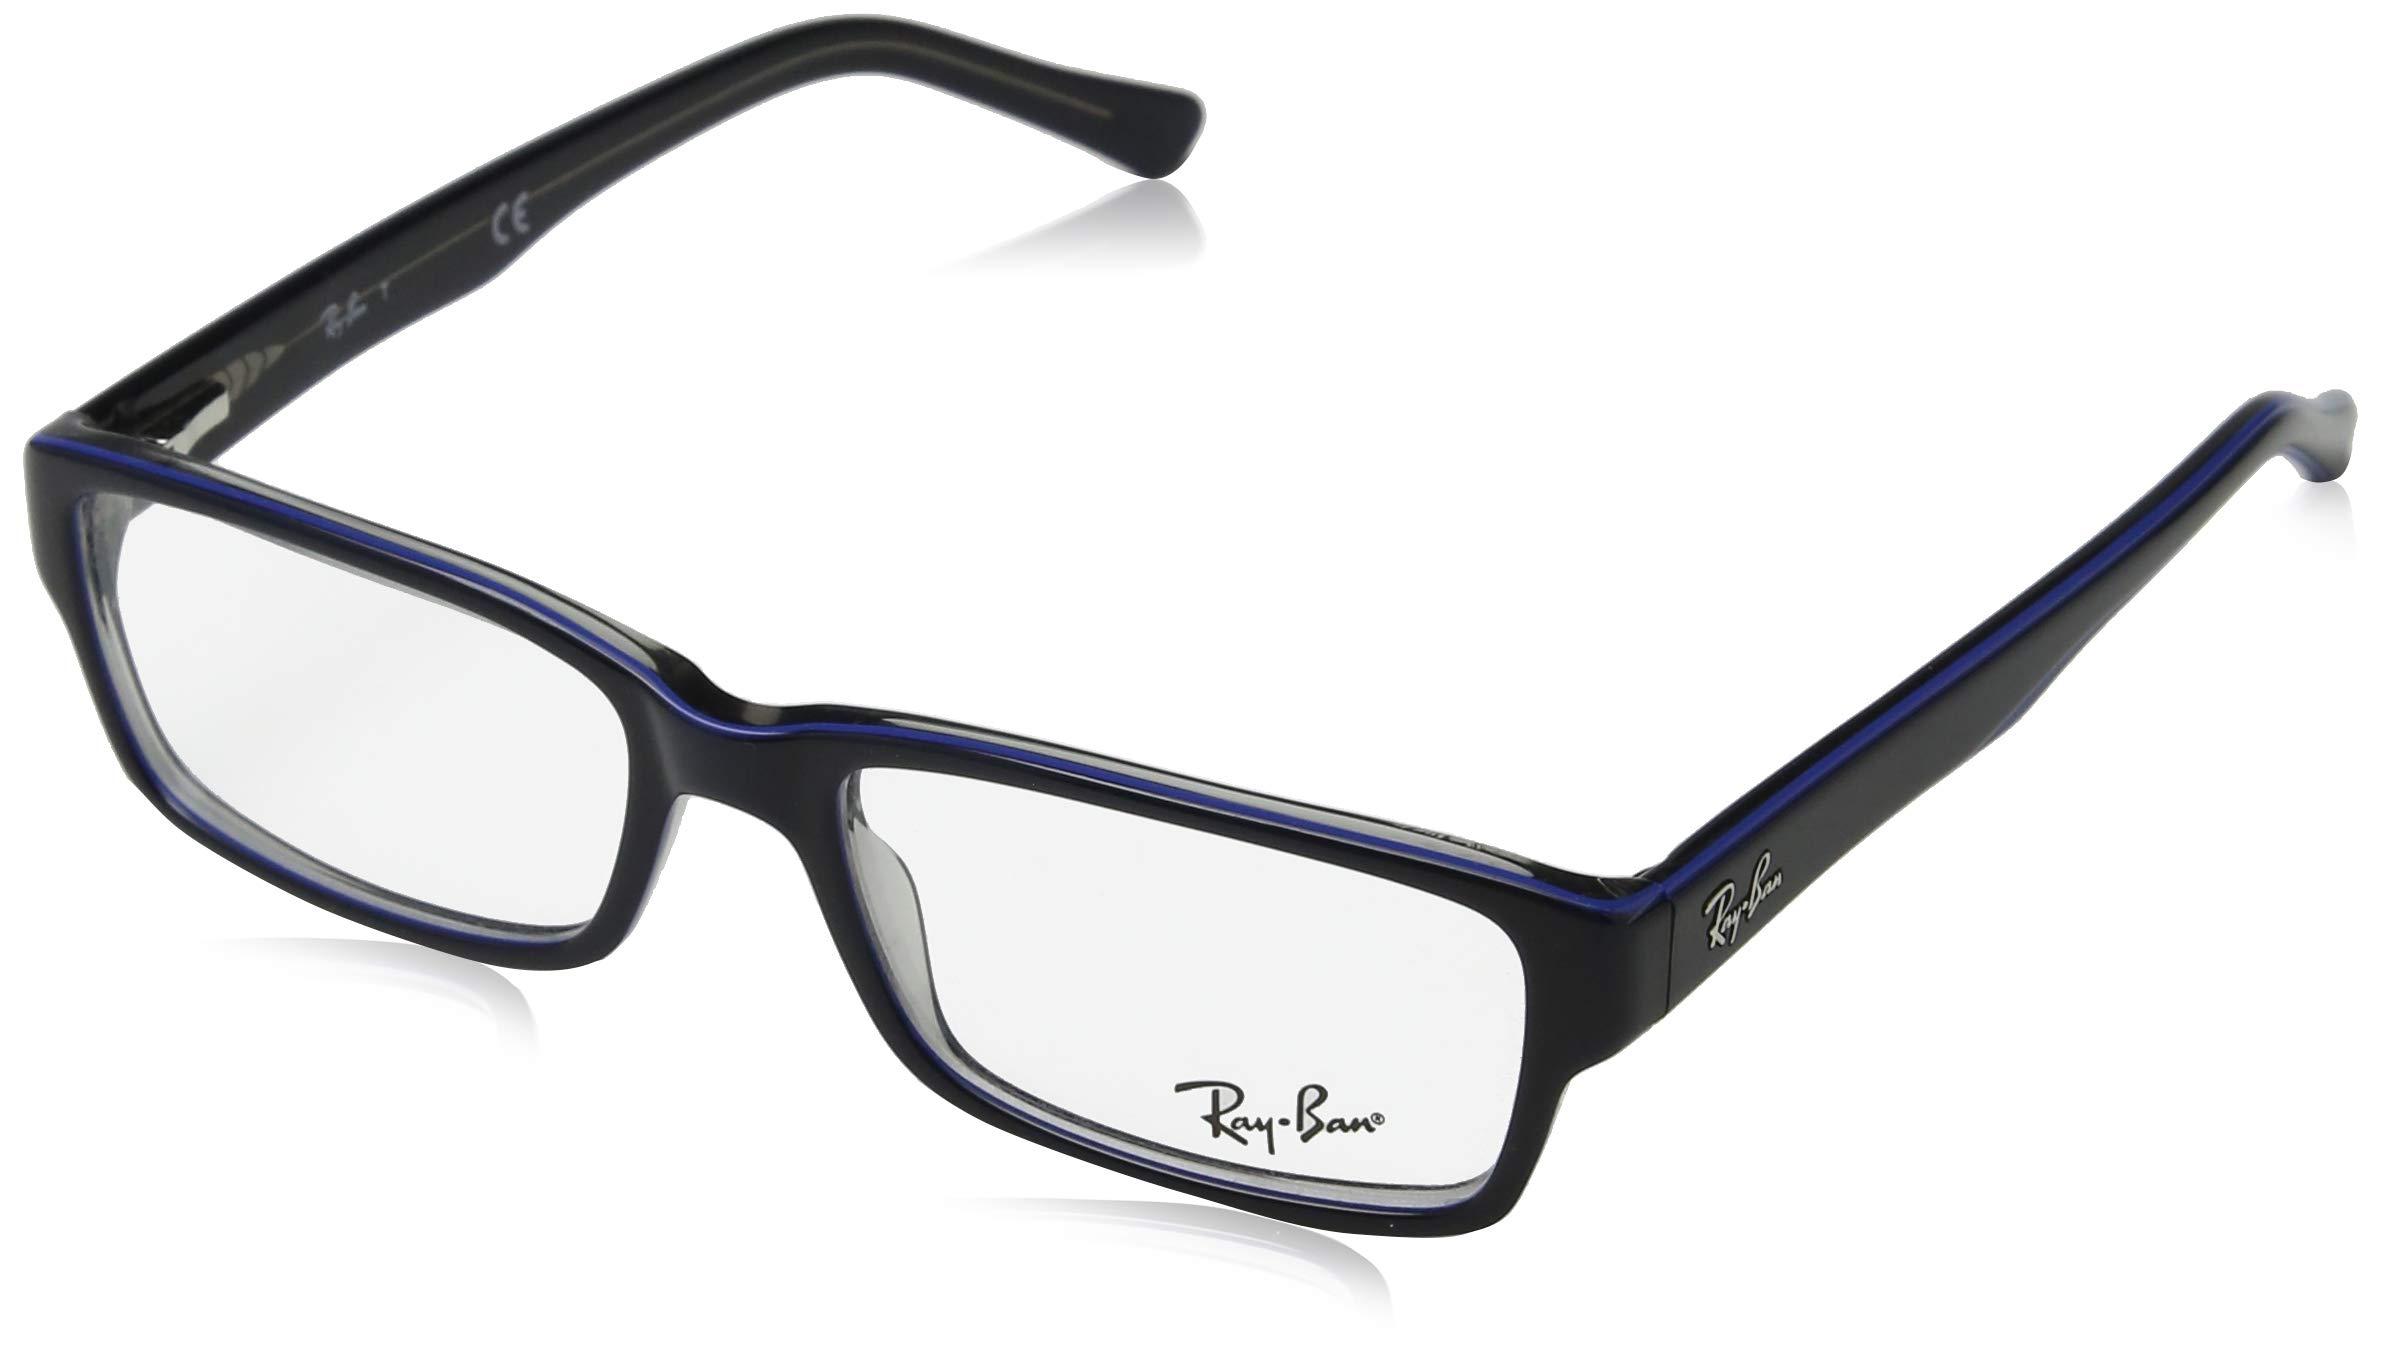 Ray-Ban RX5169 Rectangular Eyeglass Frames, Blue on Grey/Demo Lens, 52 mm